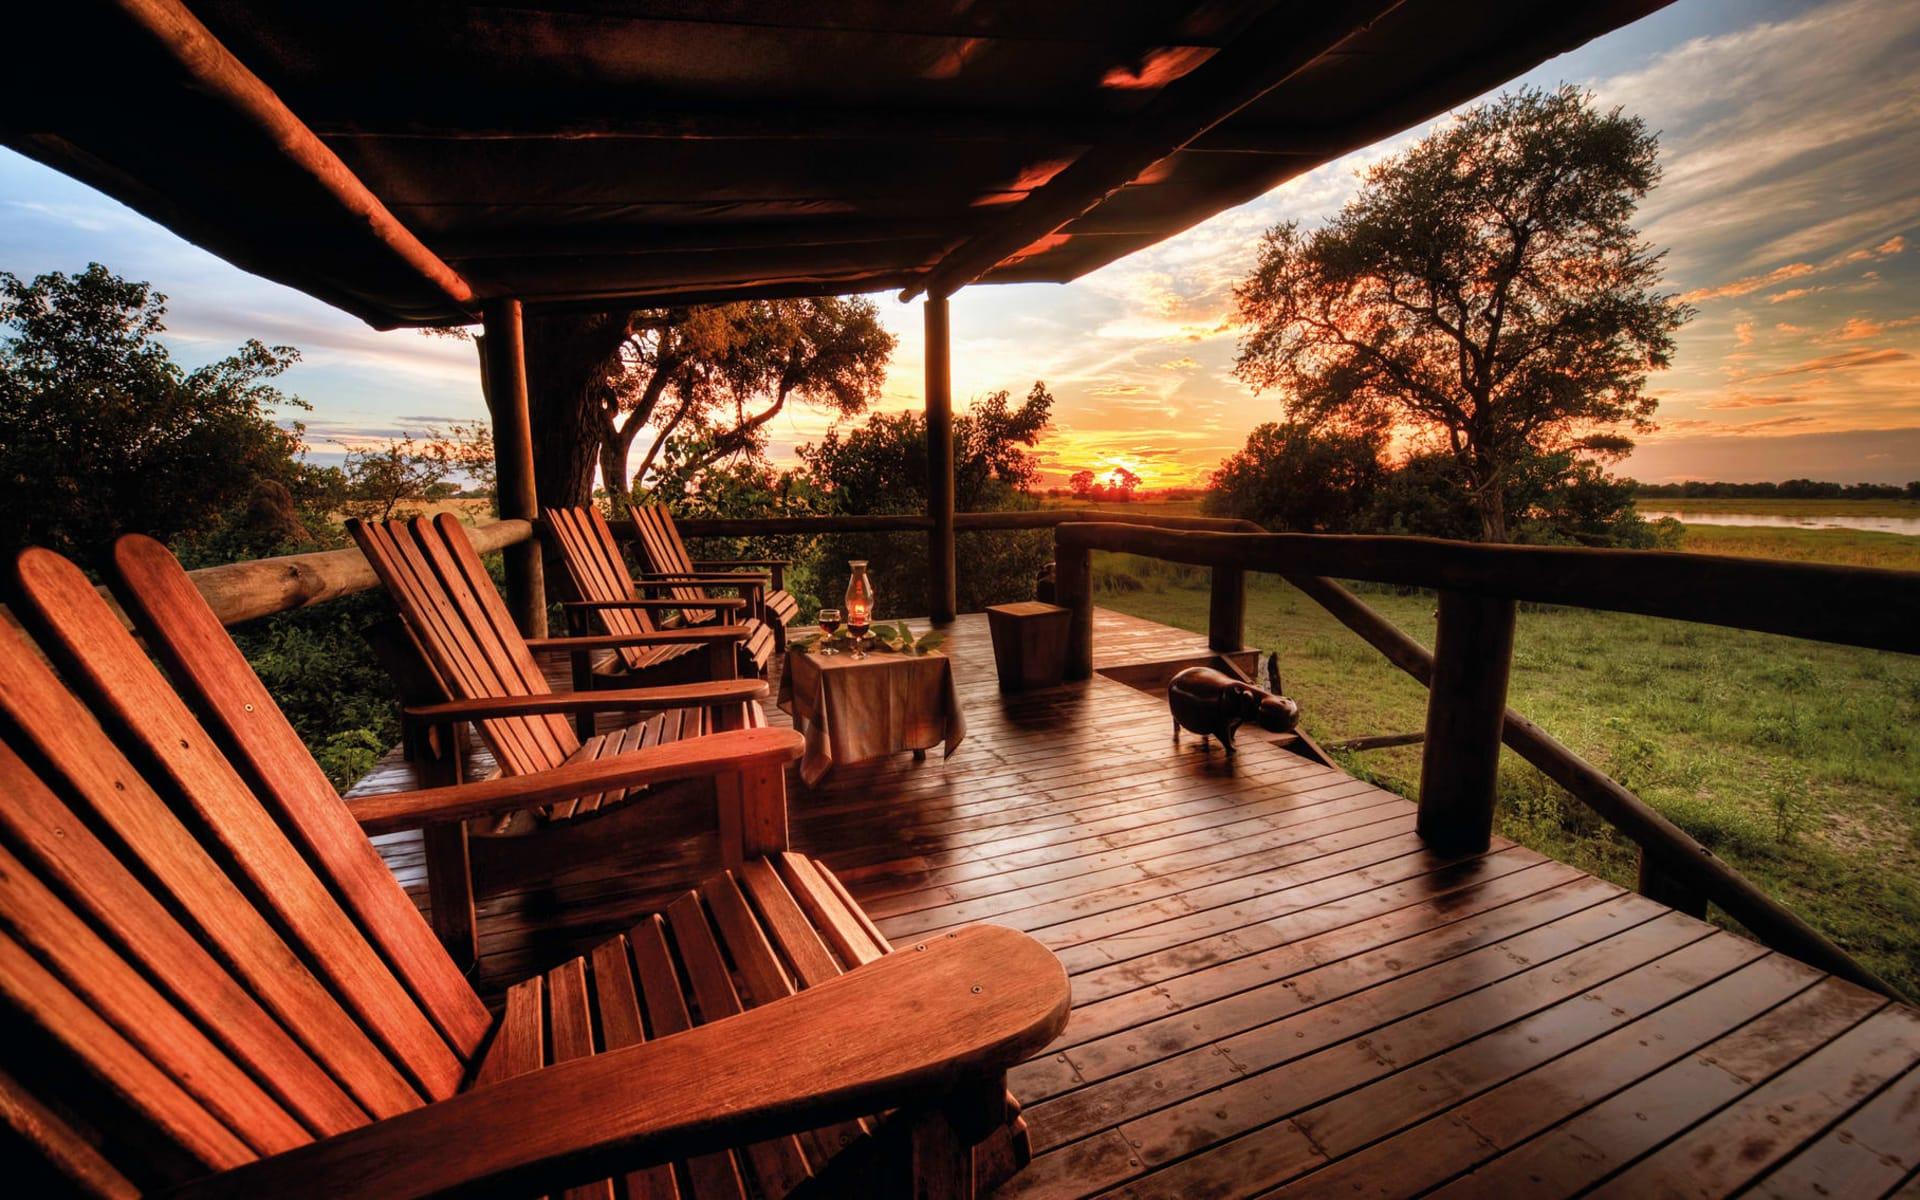 Kwara in Okavango Delta: Kwara - Terrasse mit Sonnenuntergang c Kwando